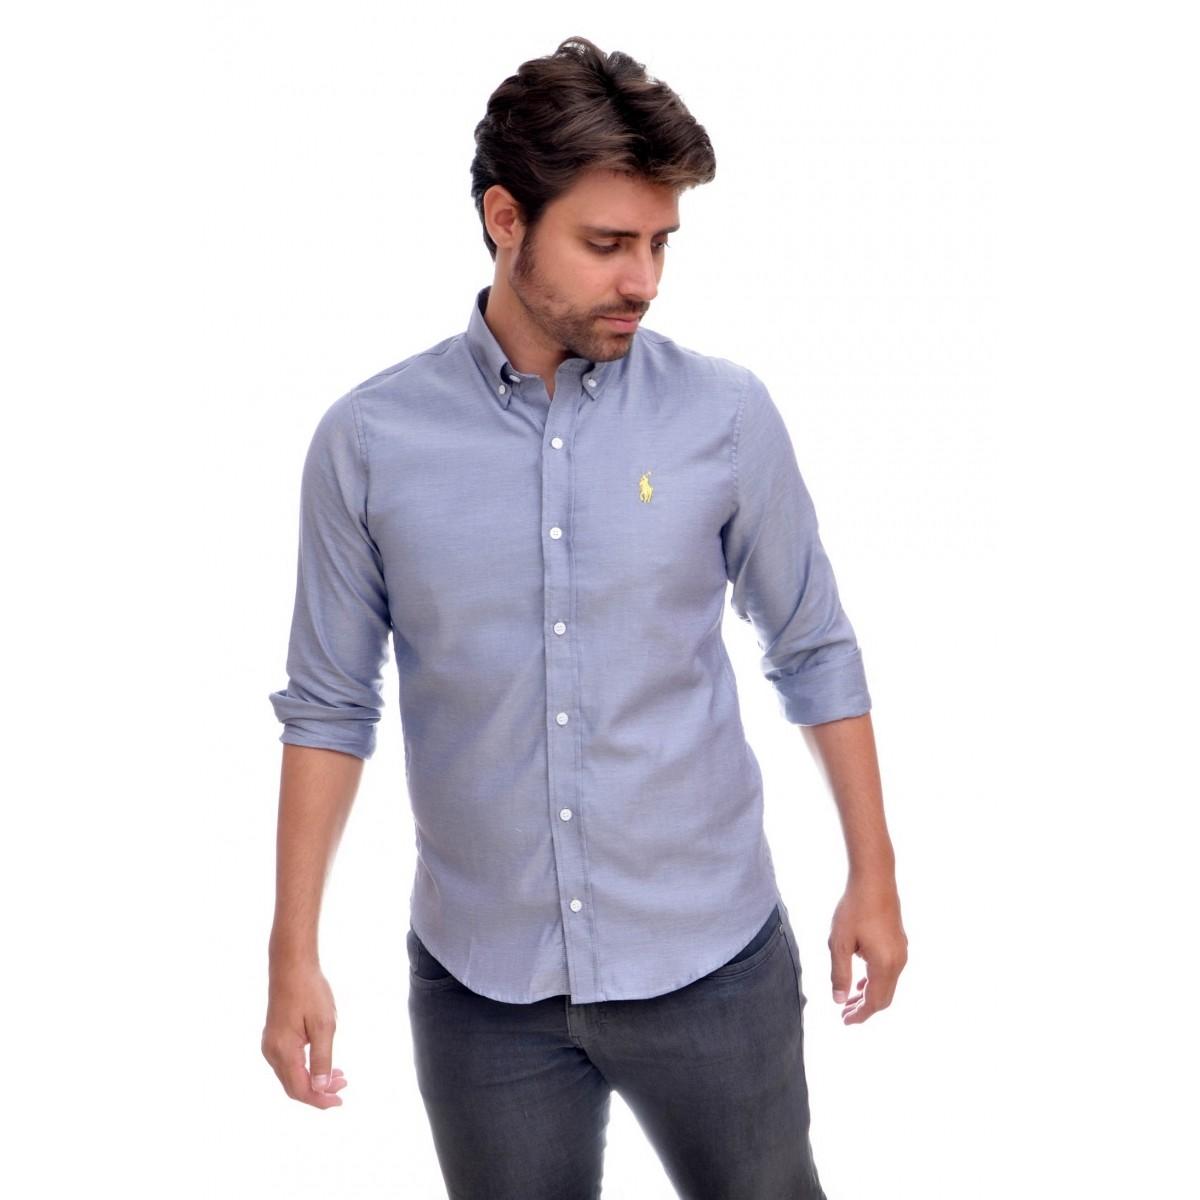 Camisa Social RL Oxford Preto - Regular Fit  - Ca Brasileira